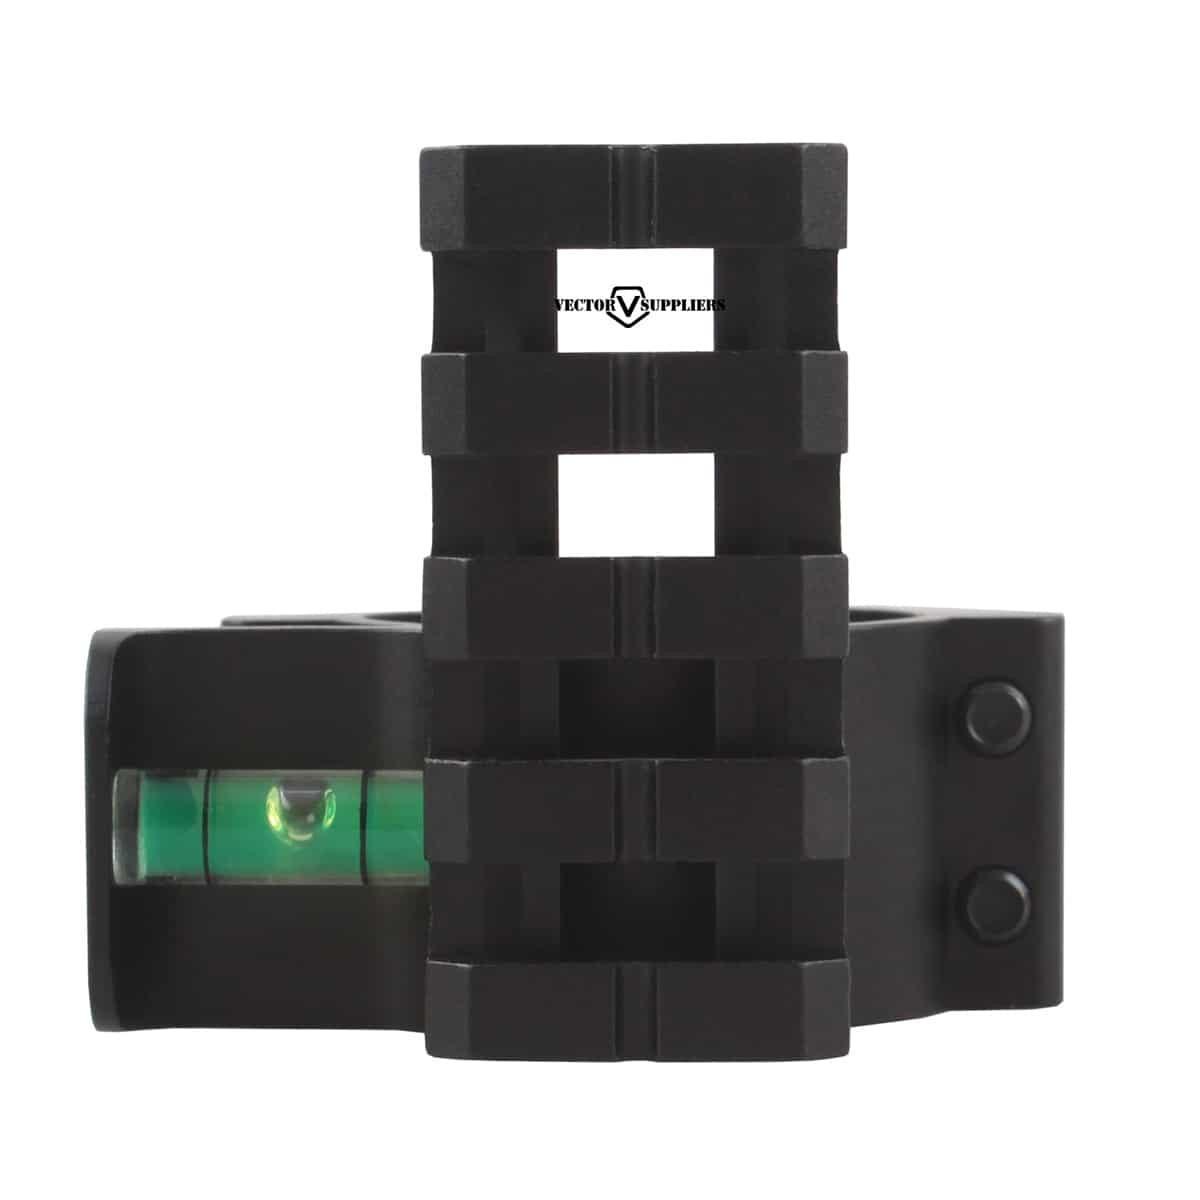 Vector Optics SCACD-07 30/25.4mm Offset Level Ring w/ Top Rail